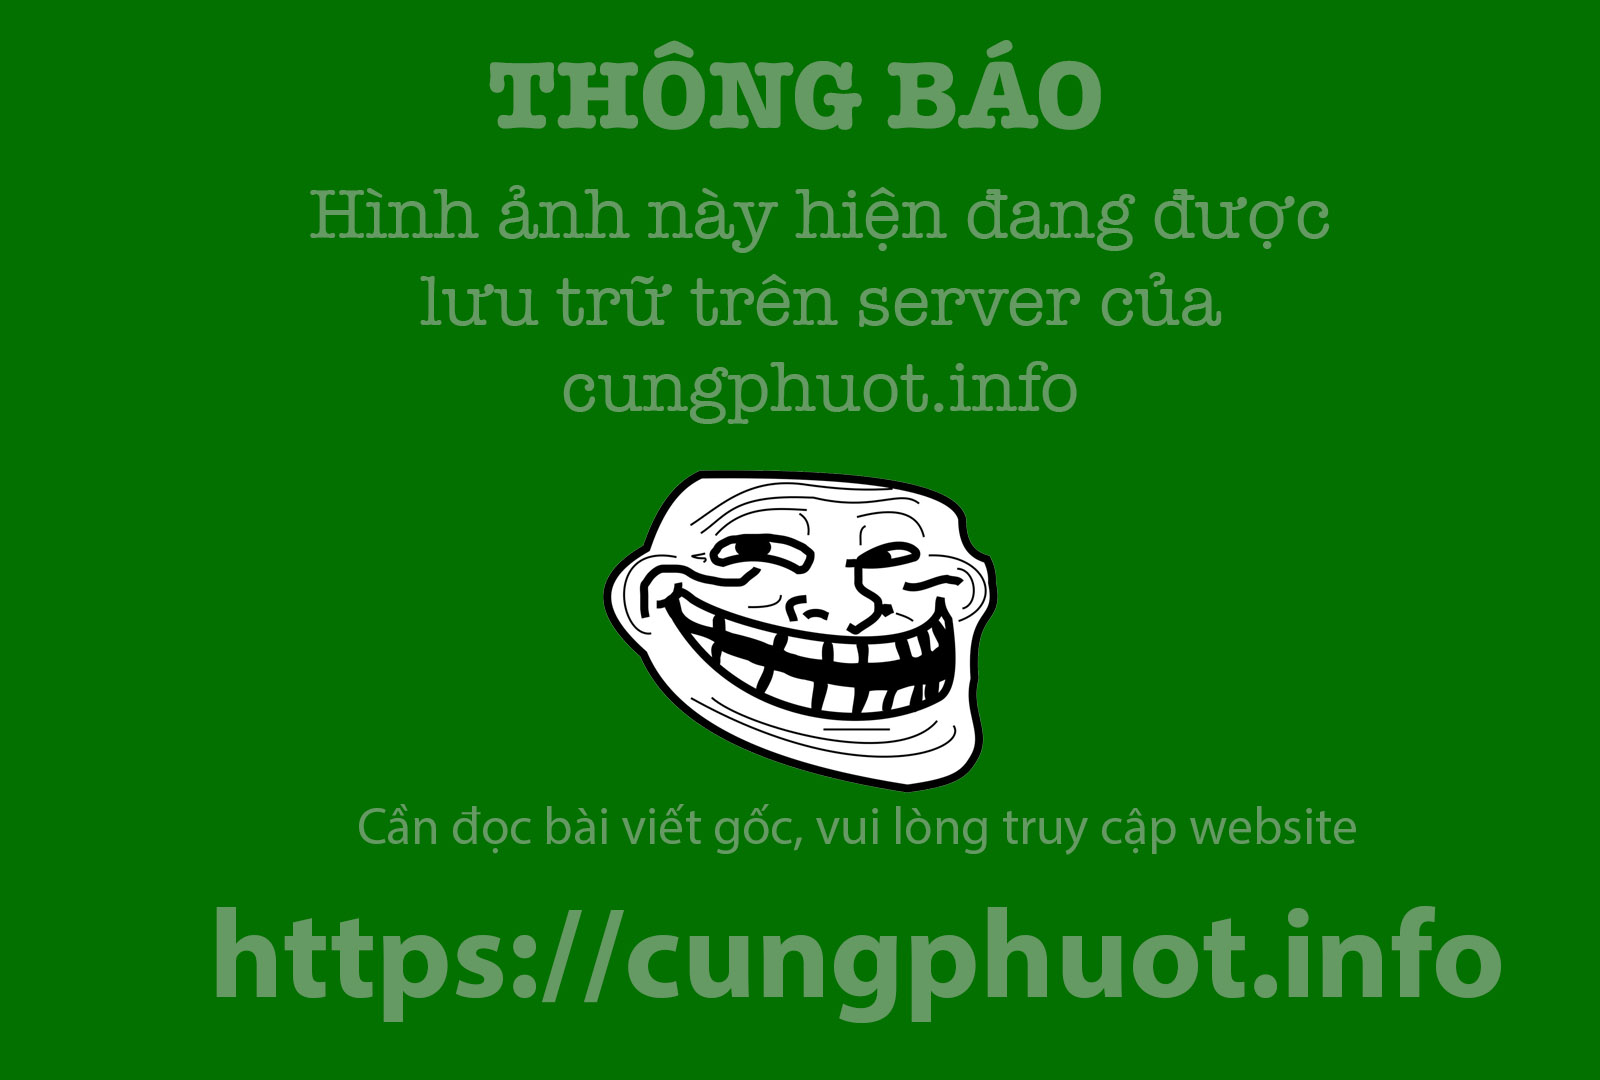 Binh minh tuyet dep tren nhung doi che Tan Cuong hinh anh 8